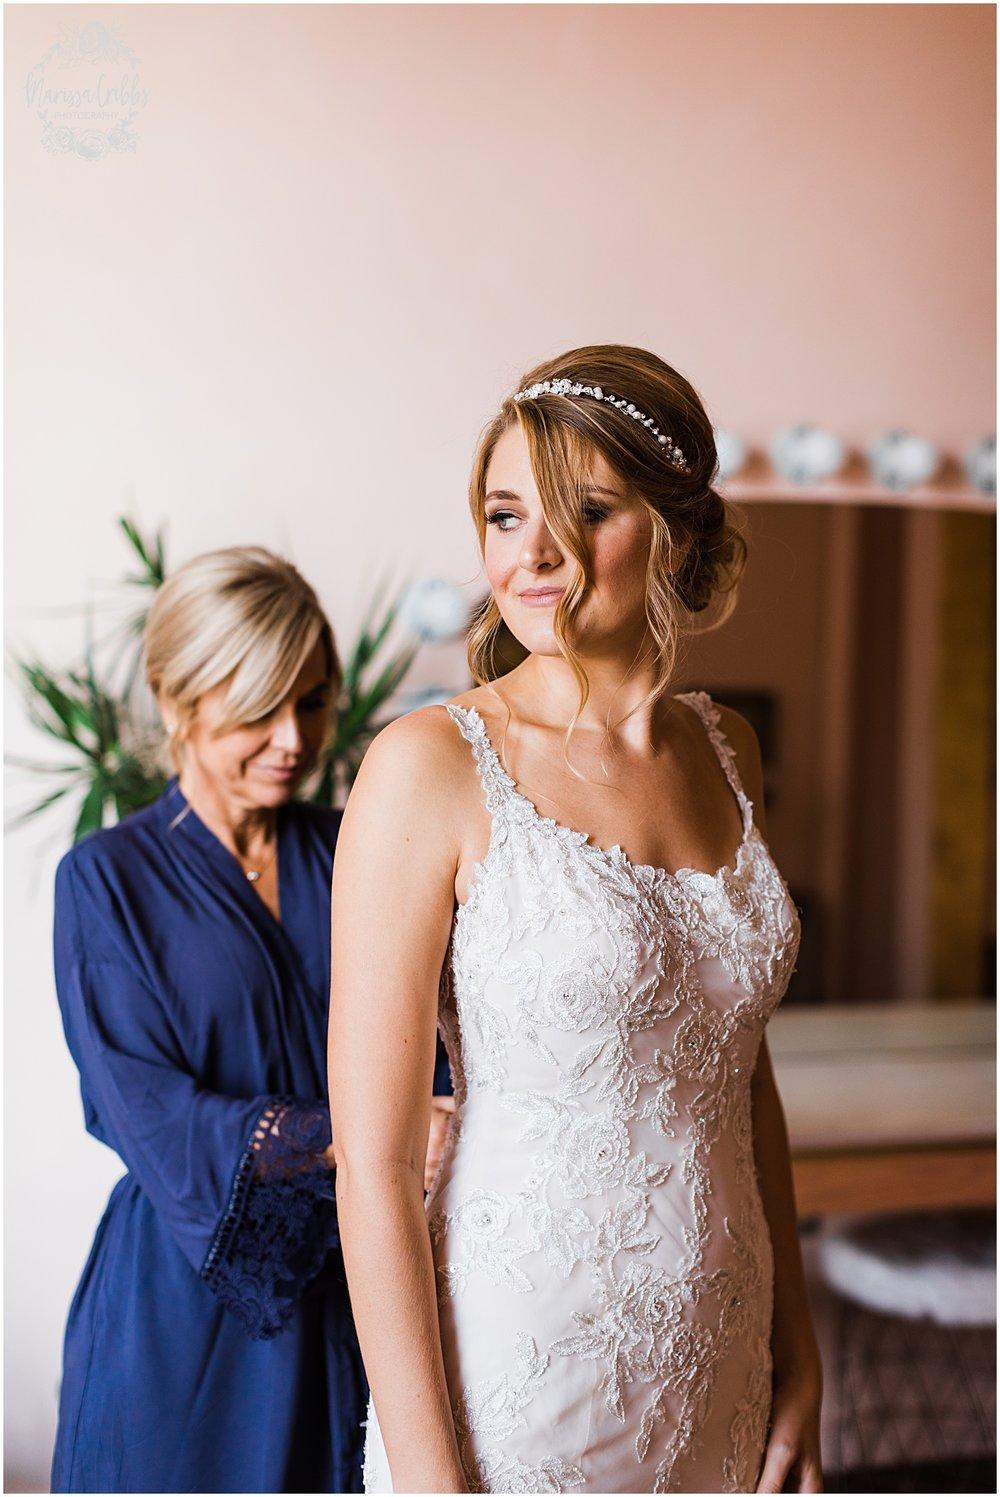 BAUER WEDDING   KELSEA & JUSTIN   MARISSA CRIBBS PHOTOGRAPHY_6493.jpg